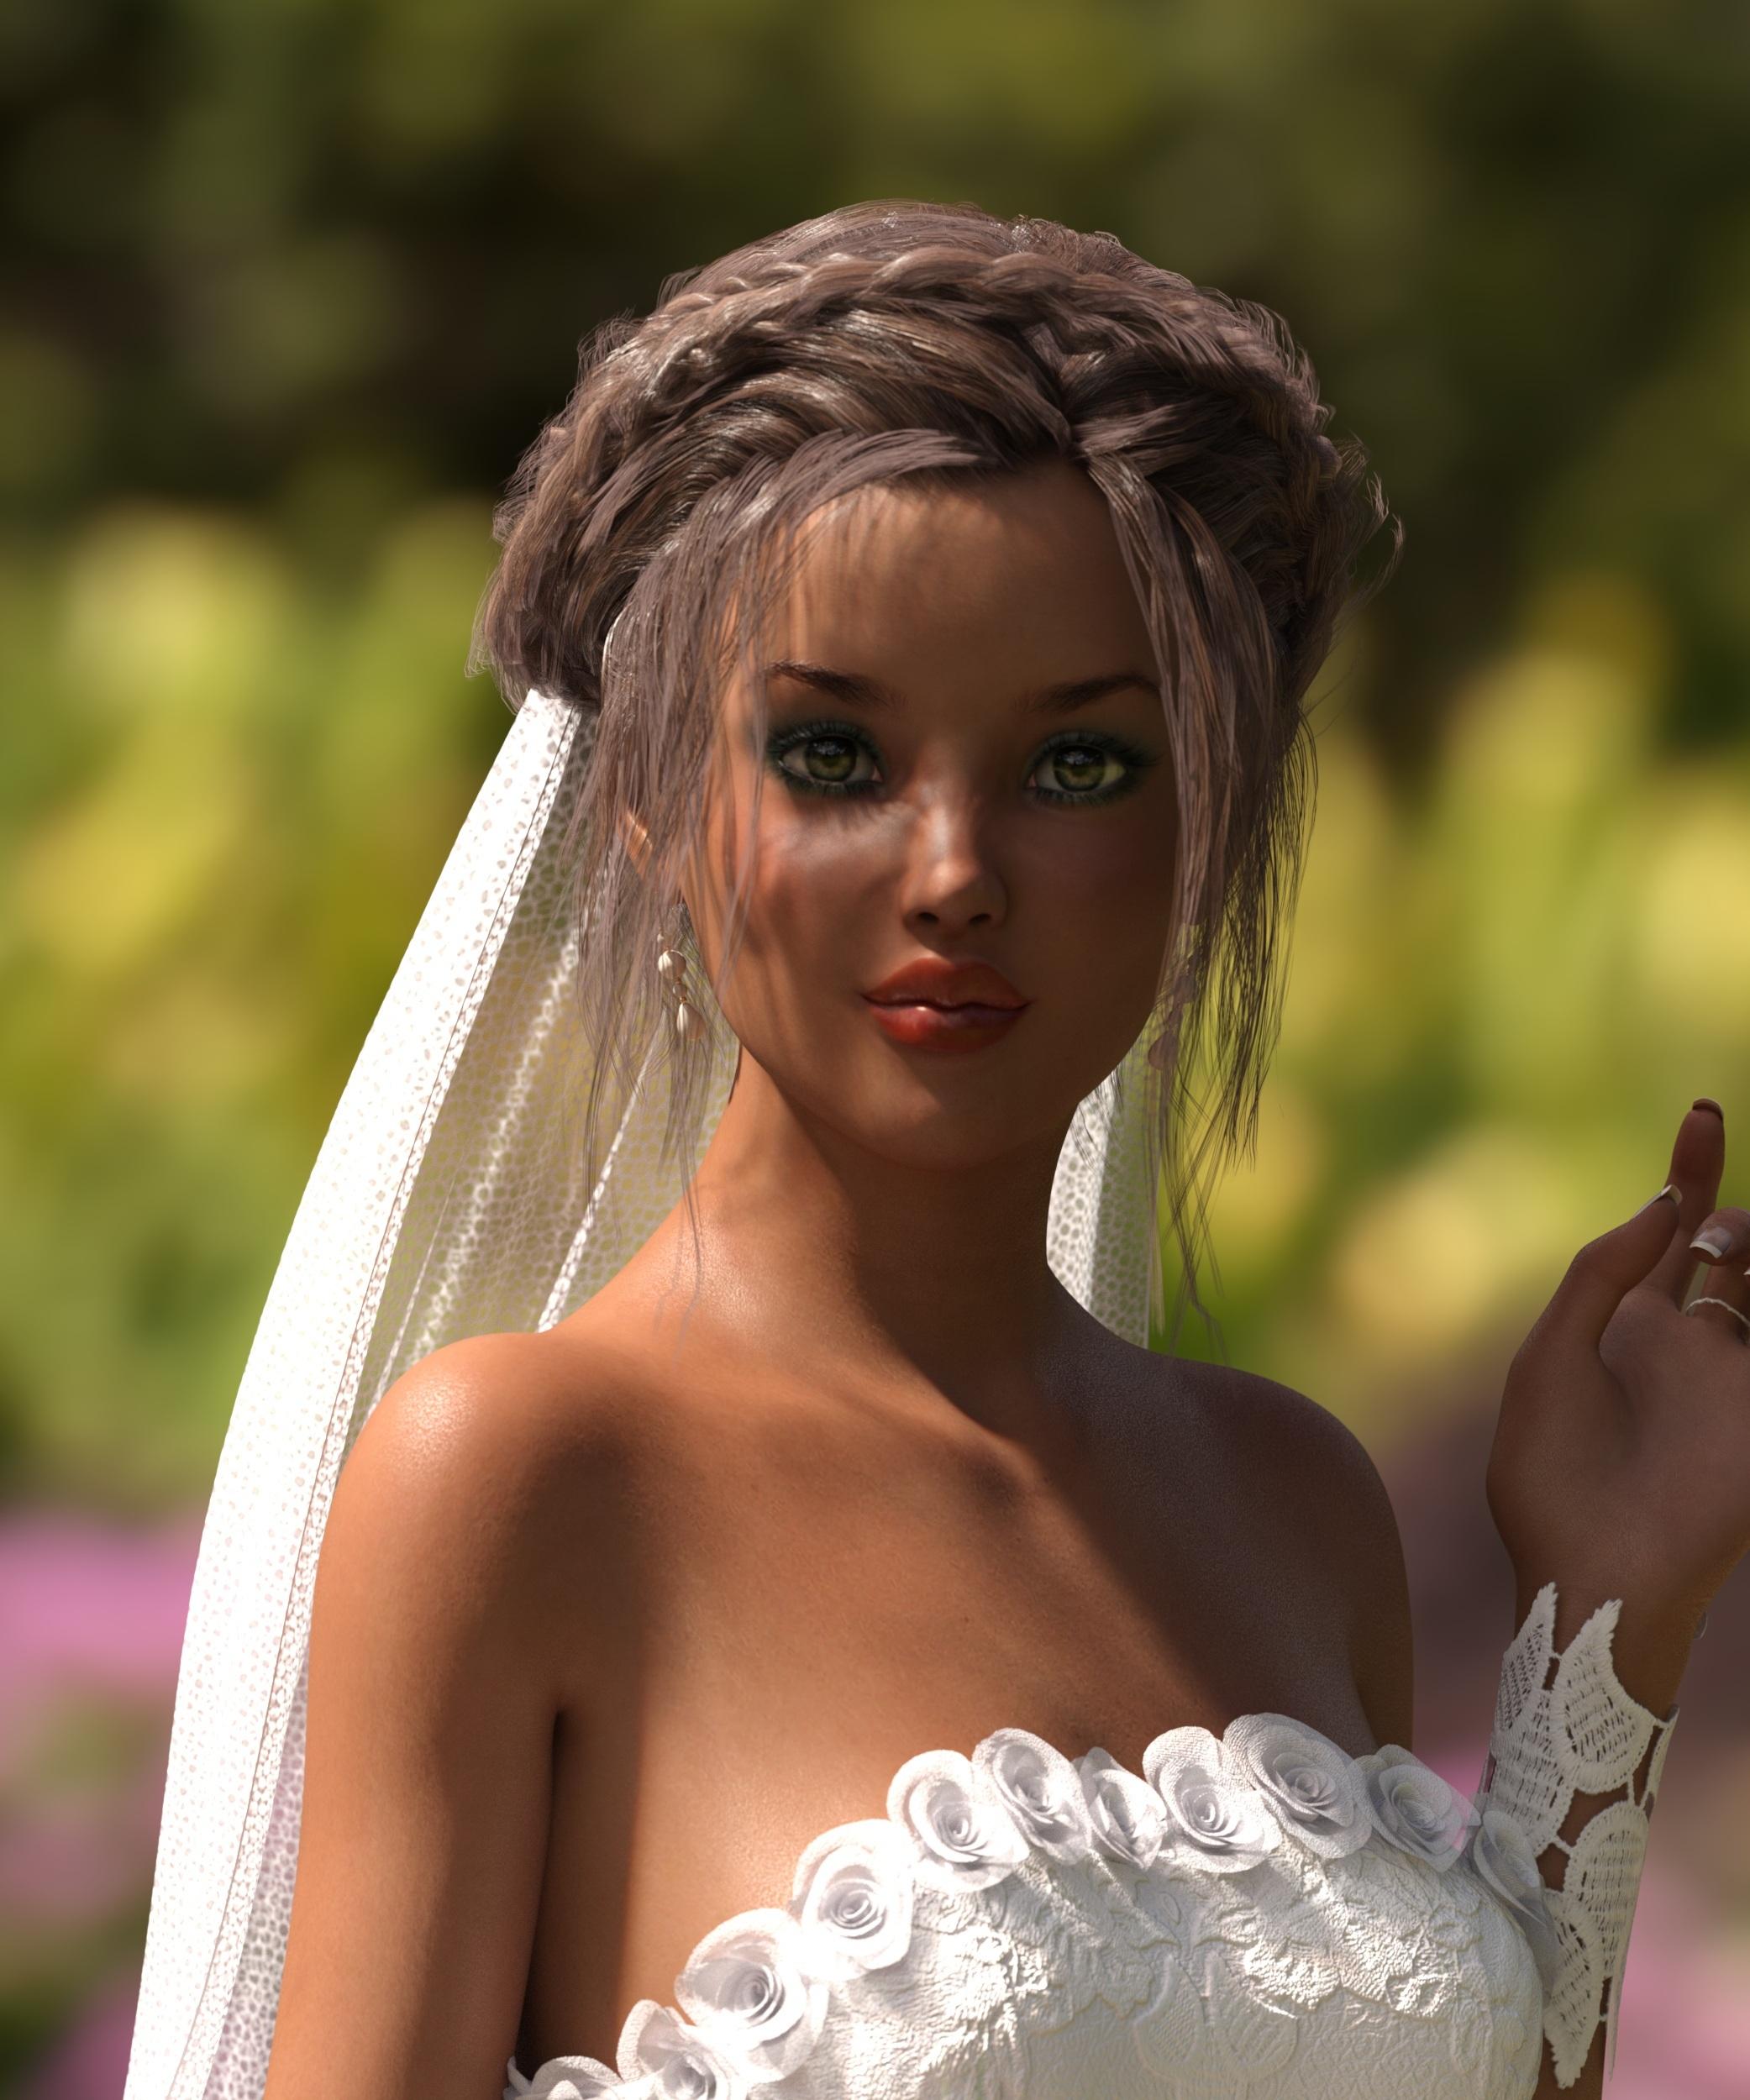 Free Images Girl Portrait Model Fashion Lady Close Wedding